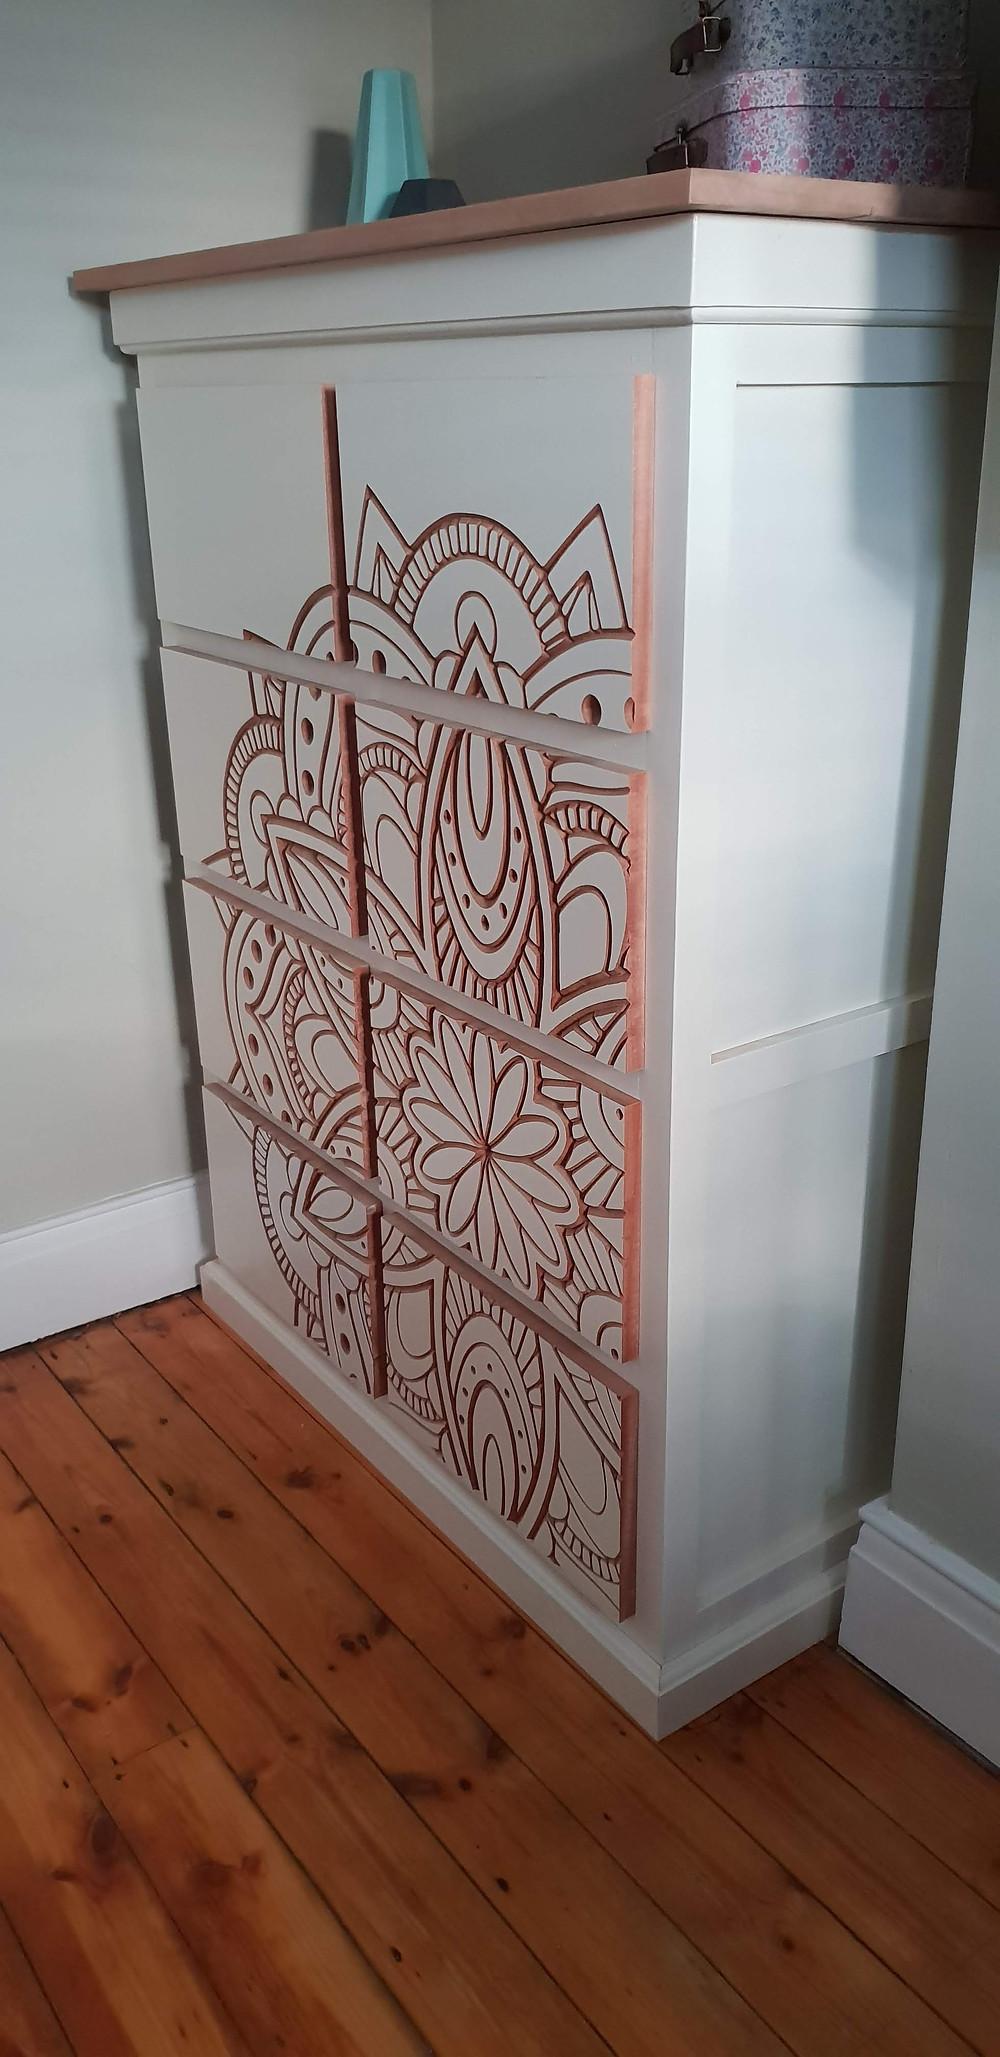 https://www.leighsworkshop.co.uk/mandala-chest-of-drawers